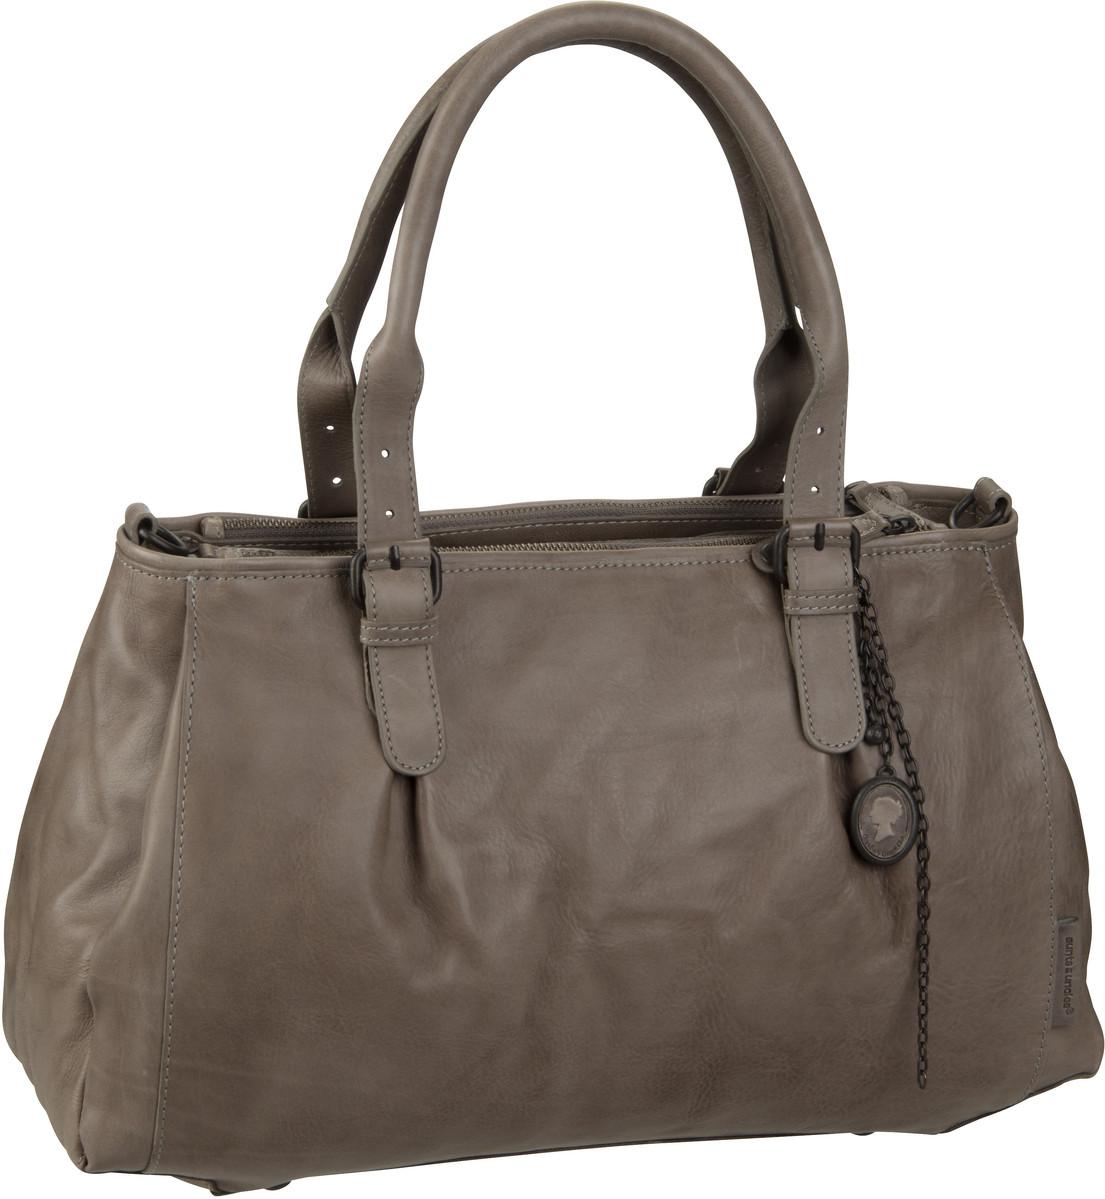 Handtasche Mrs. Shortbread Cloudburst